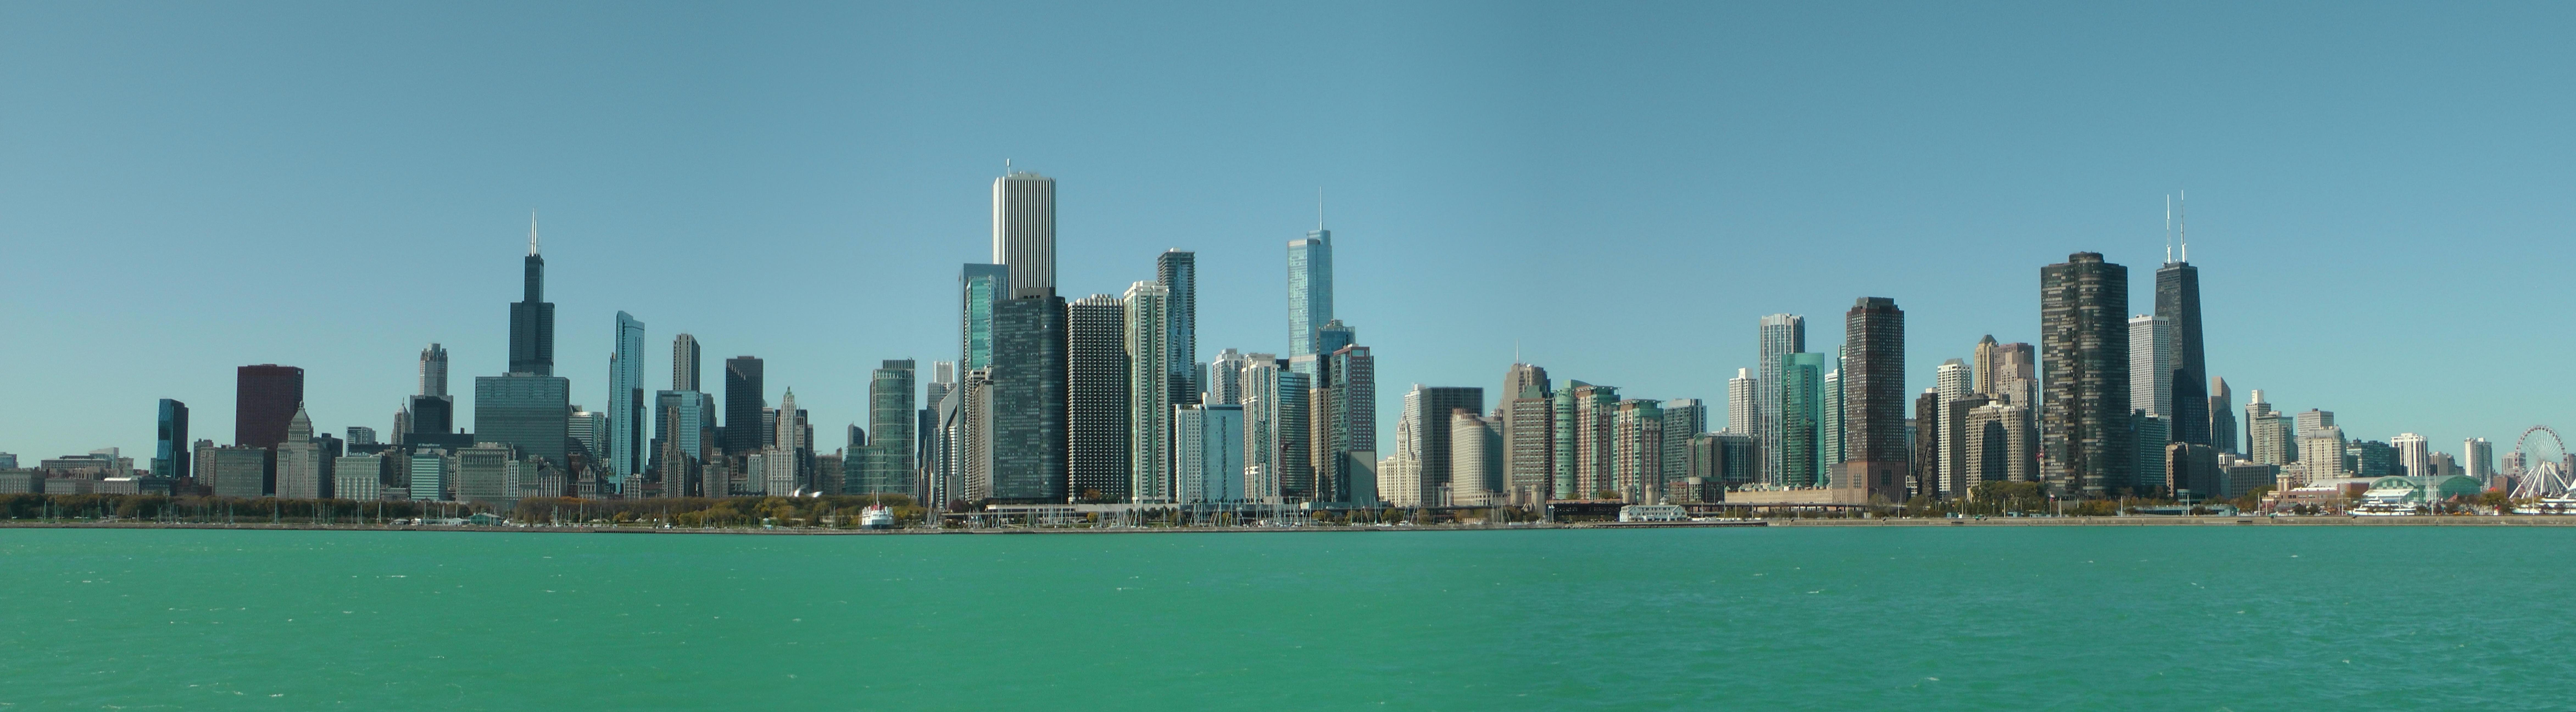 Chicago_Skyline_from_Lake_Michigan